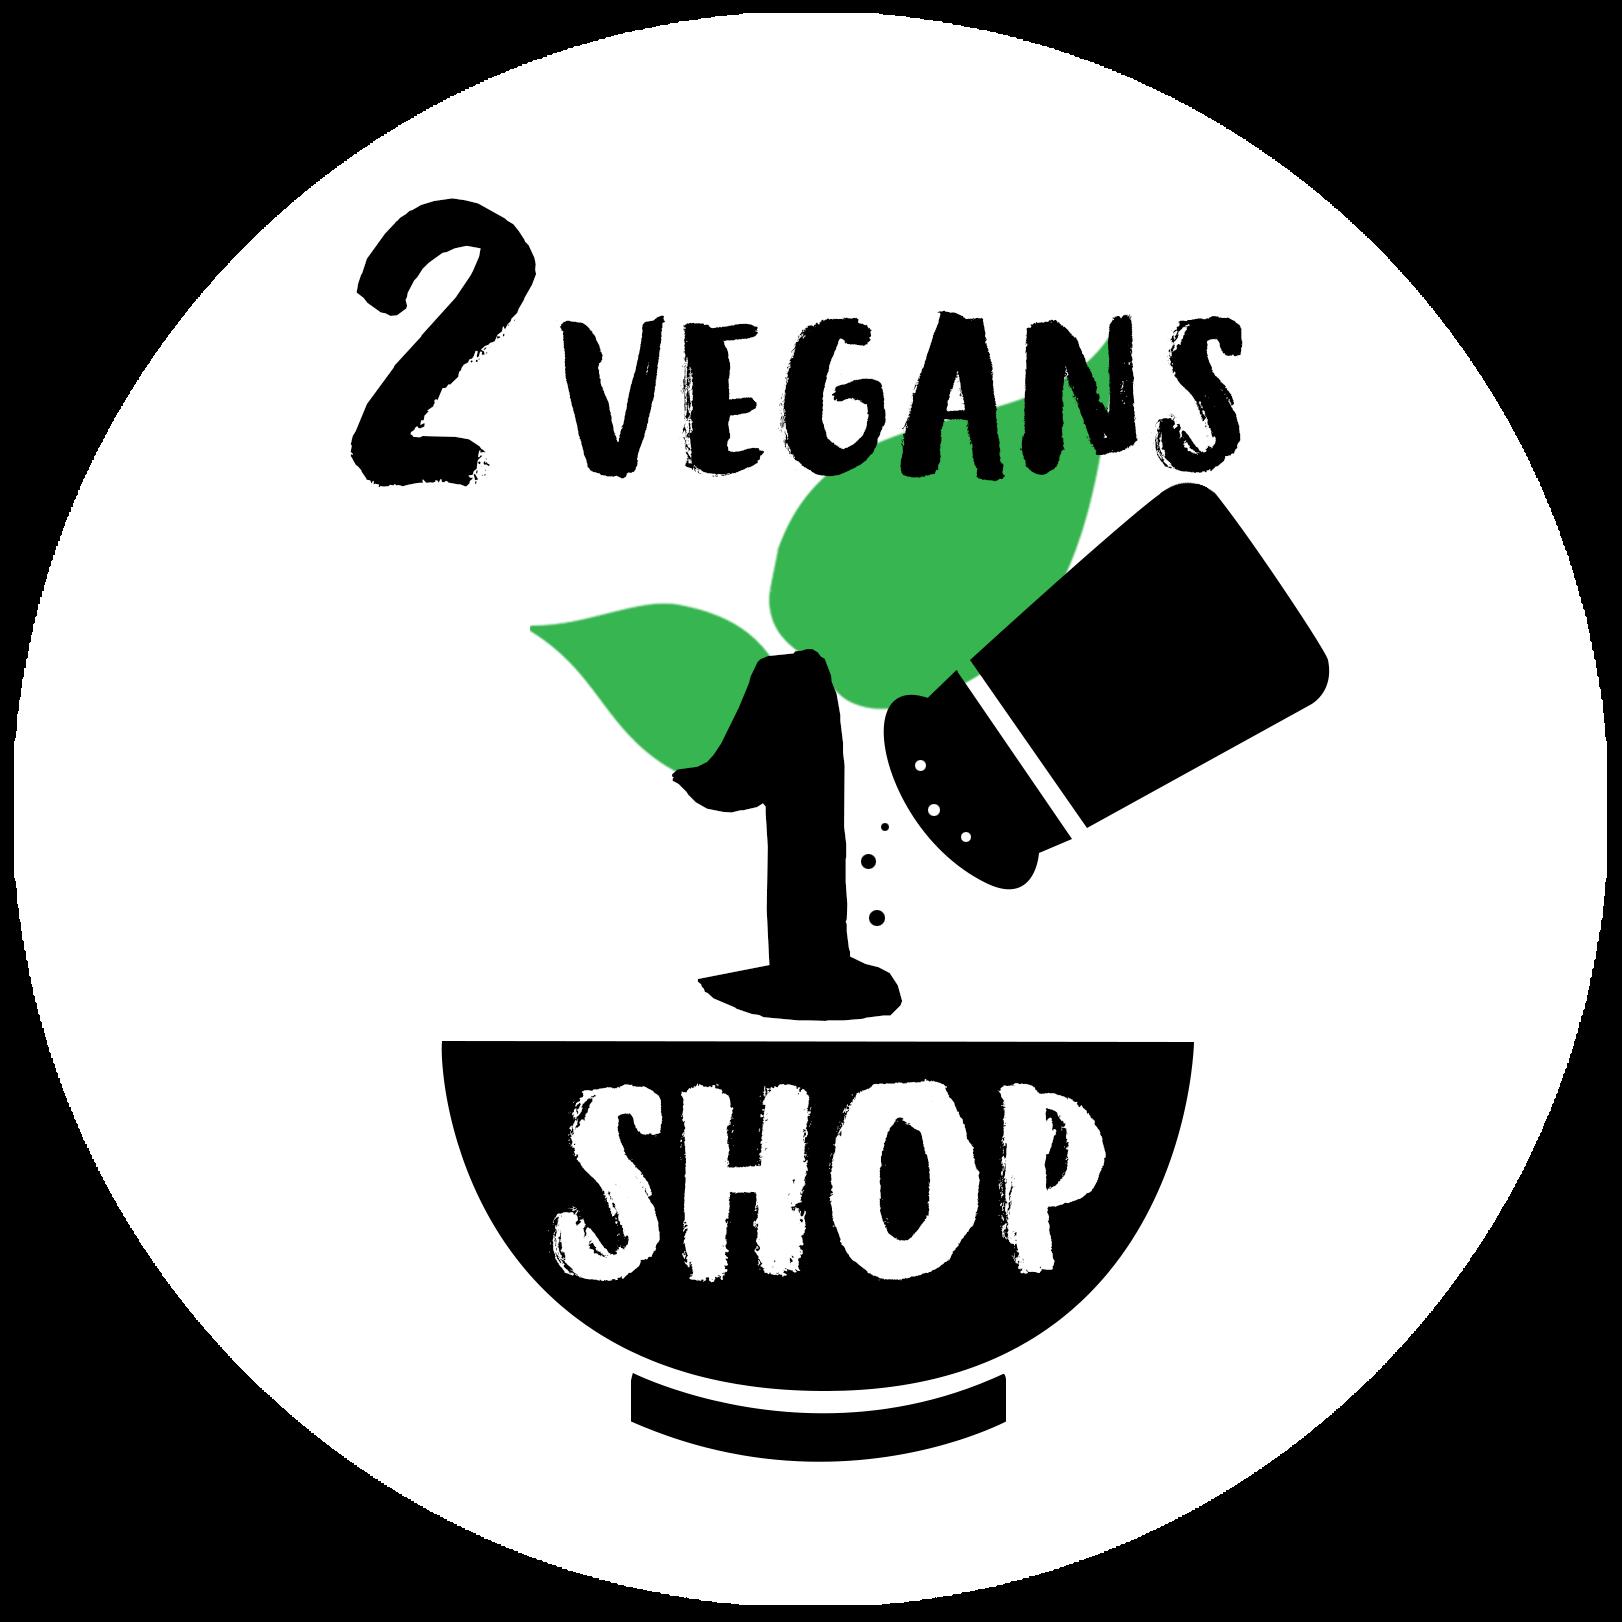 2 Vegans 1 Cup